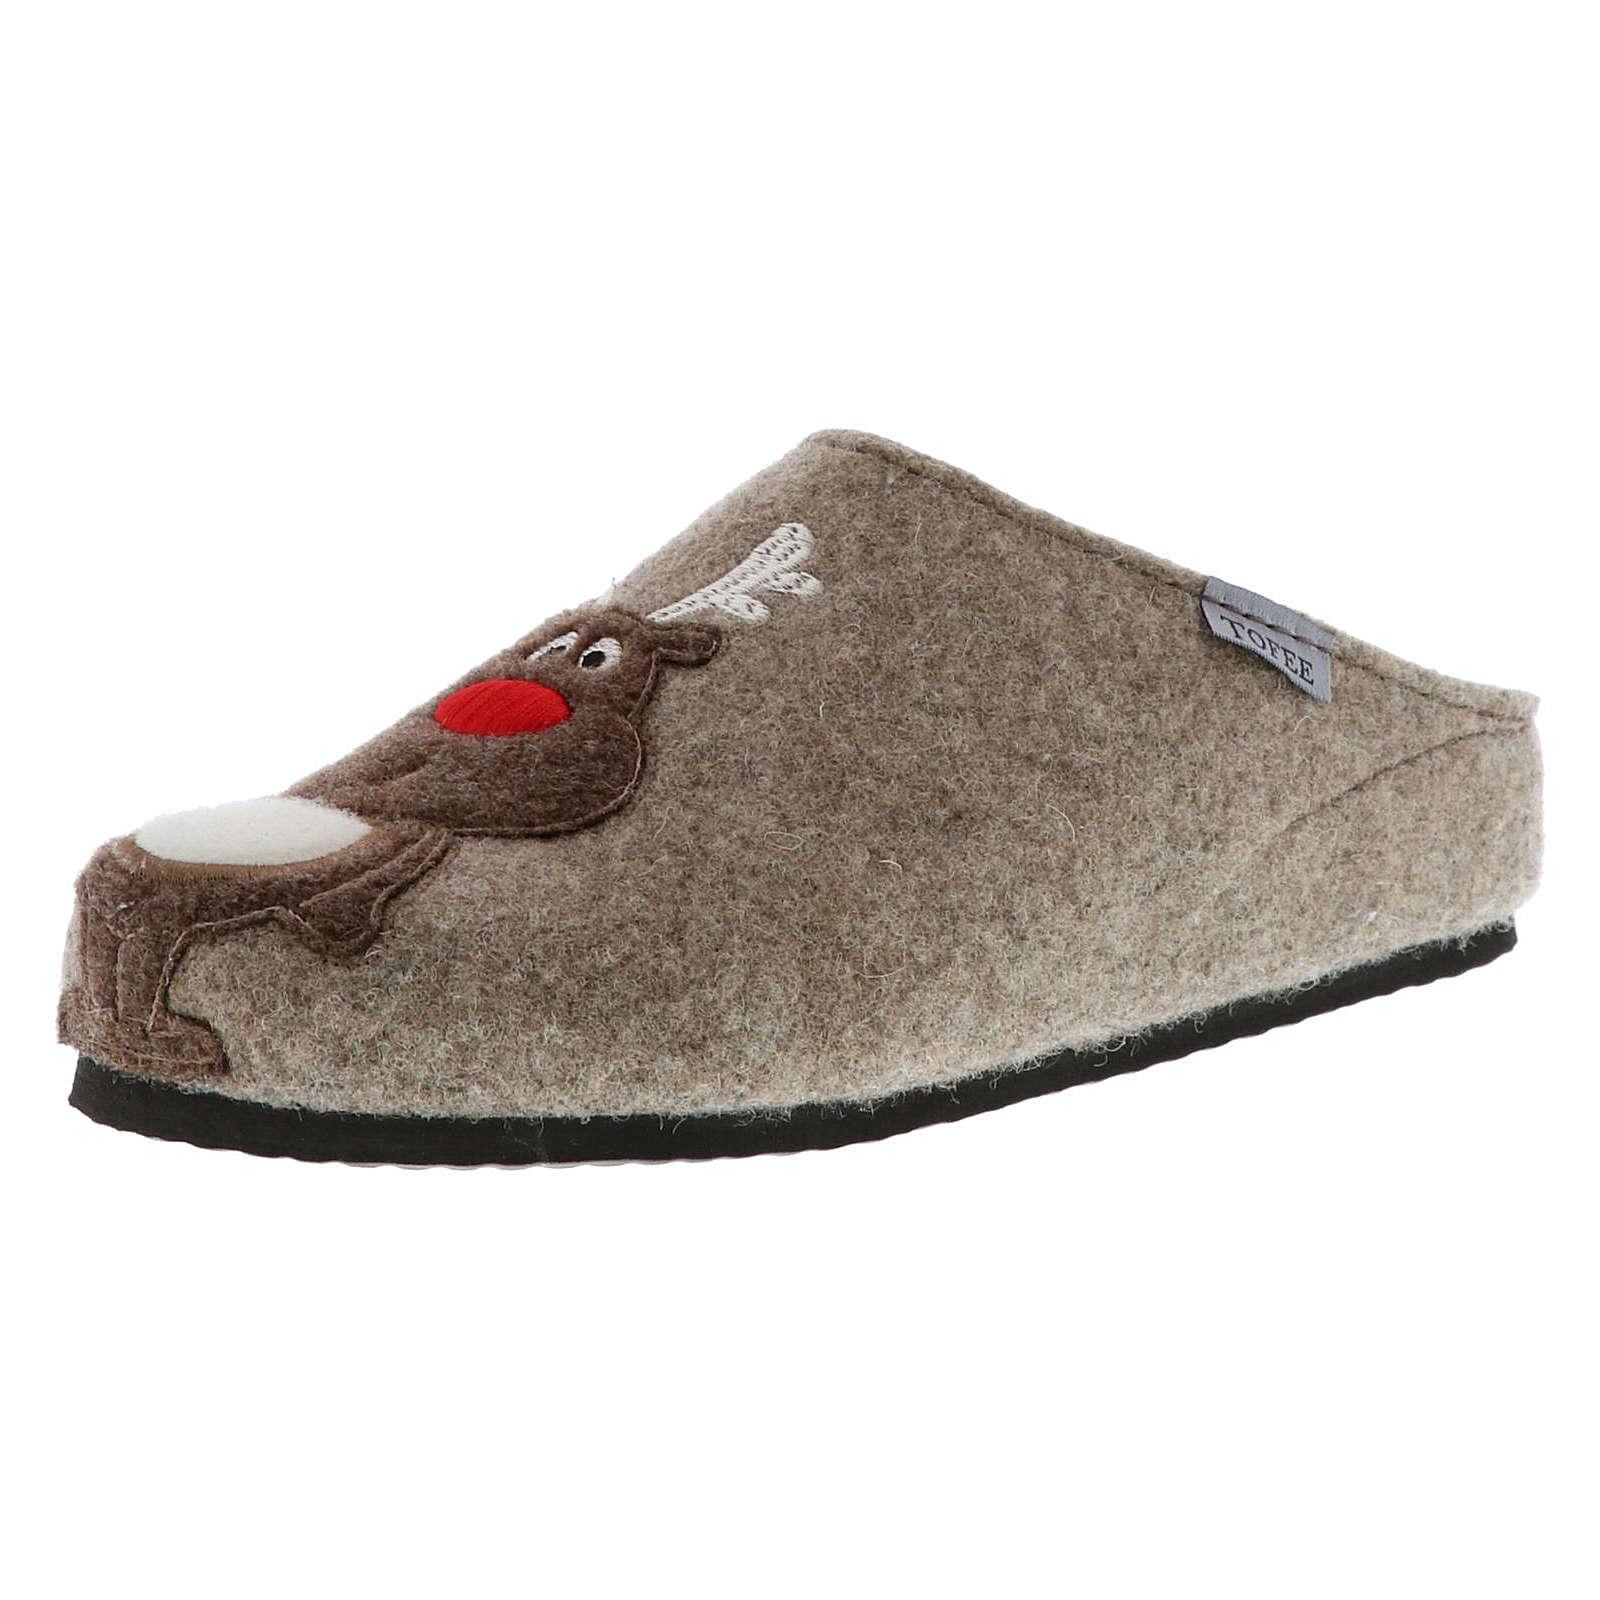 Tofee Damen Hausschuhe Pantoffeln Naturwollfilz Rentier beige beige Damen Gr. 36